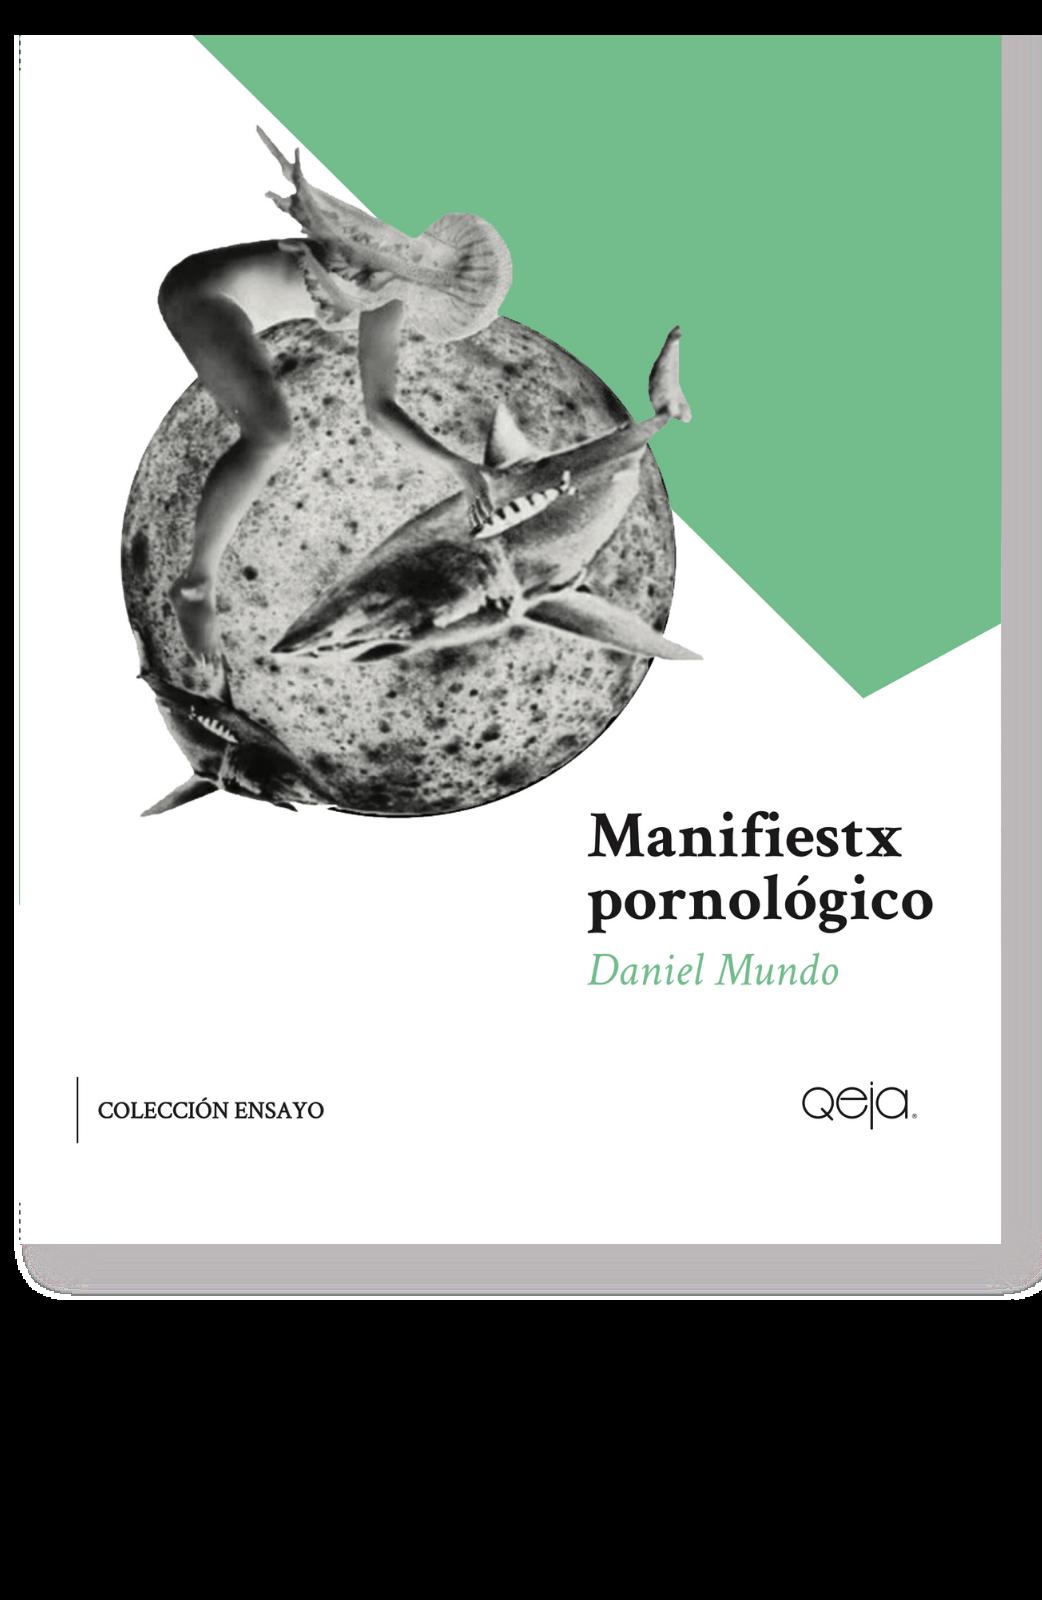 manifiestx-pornologico-daniel-mundo-qeja.png